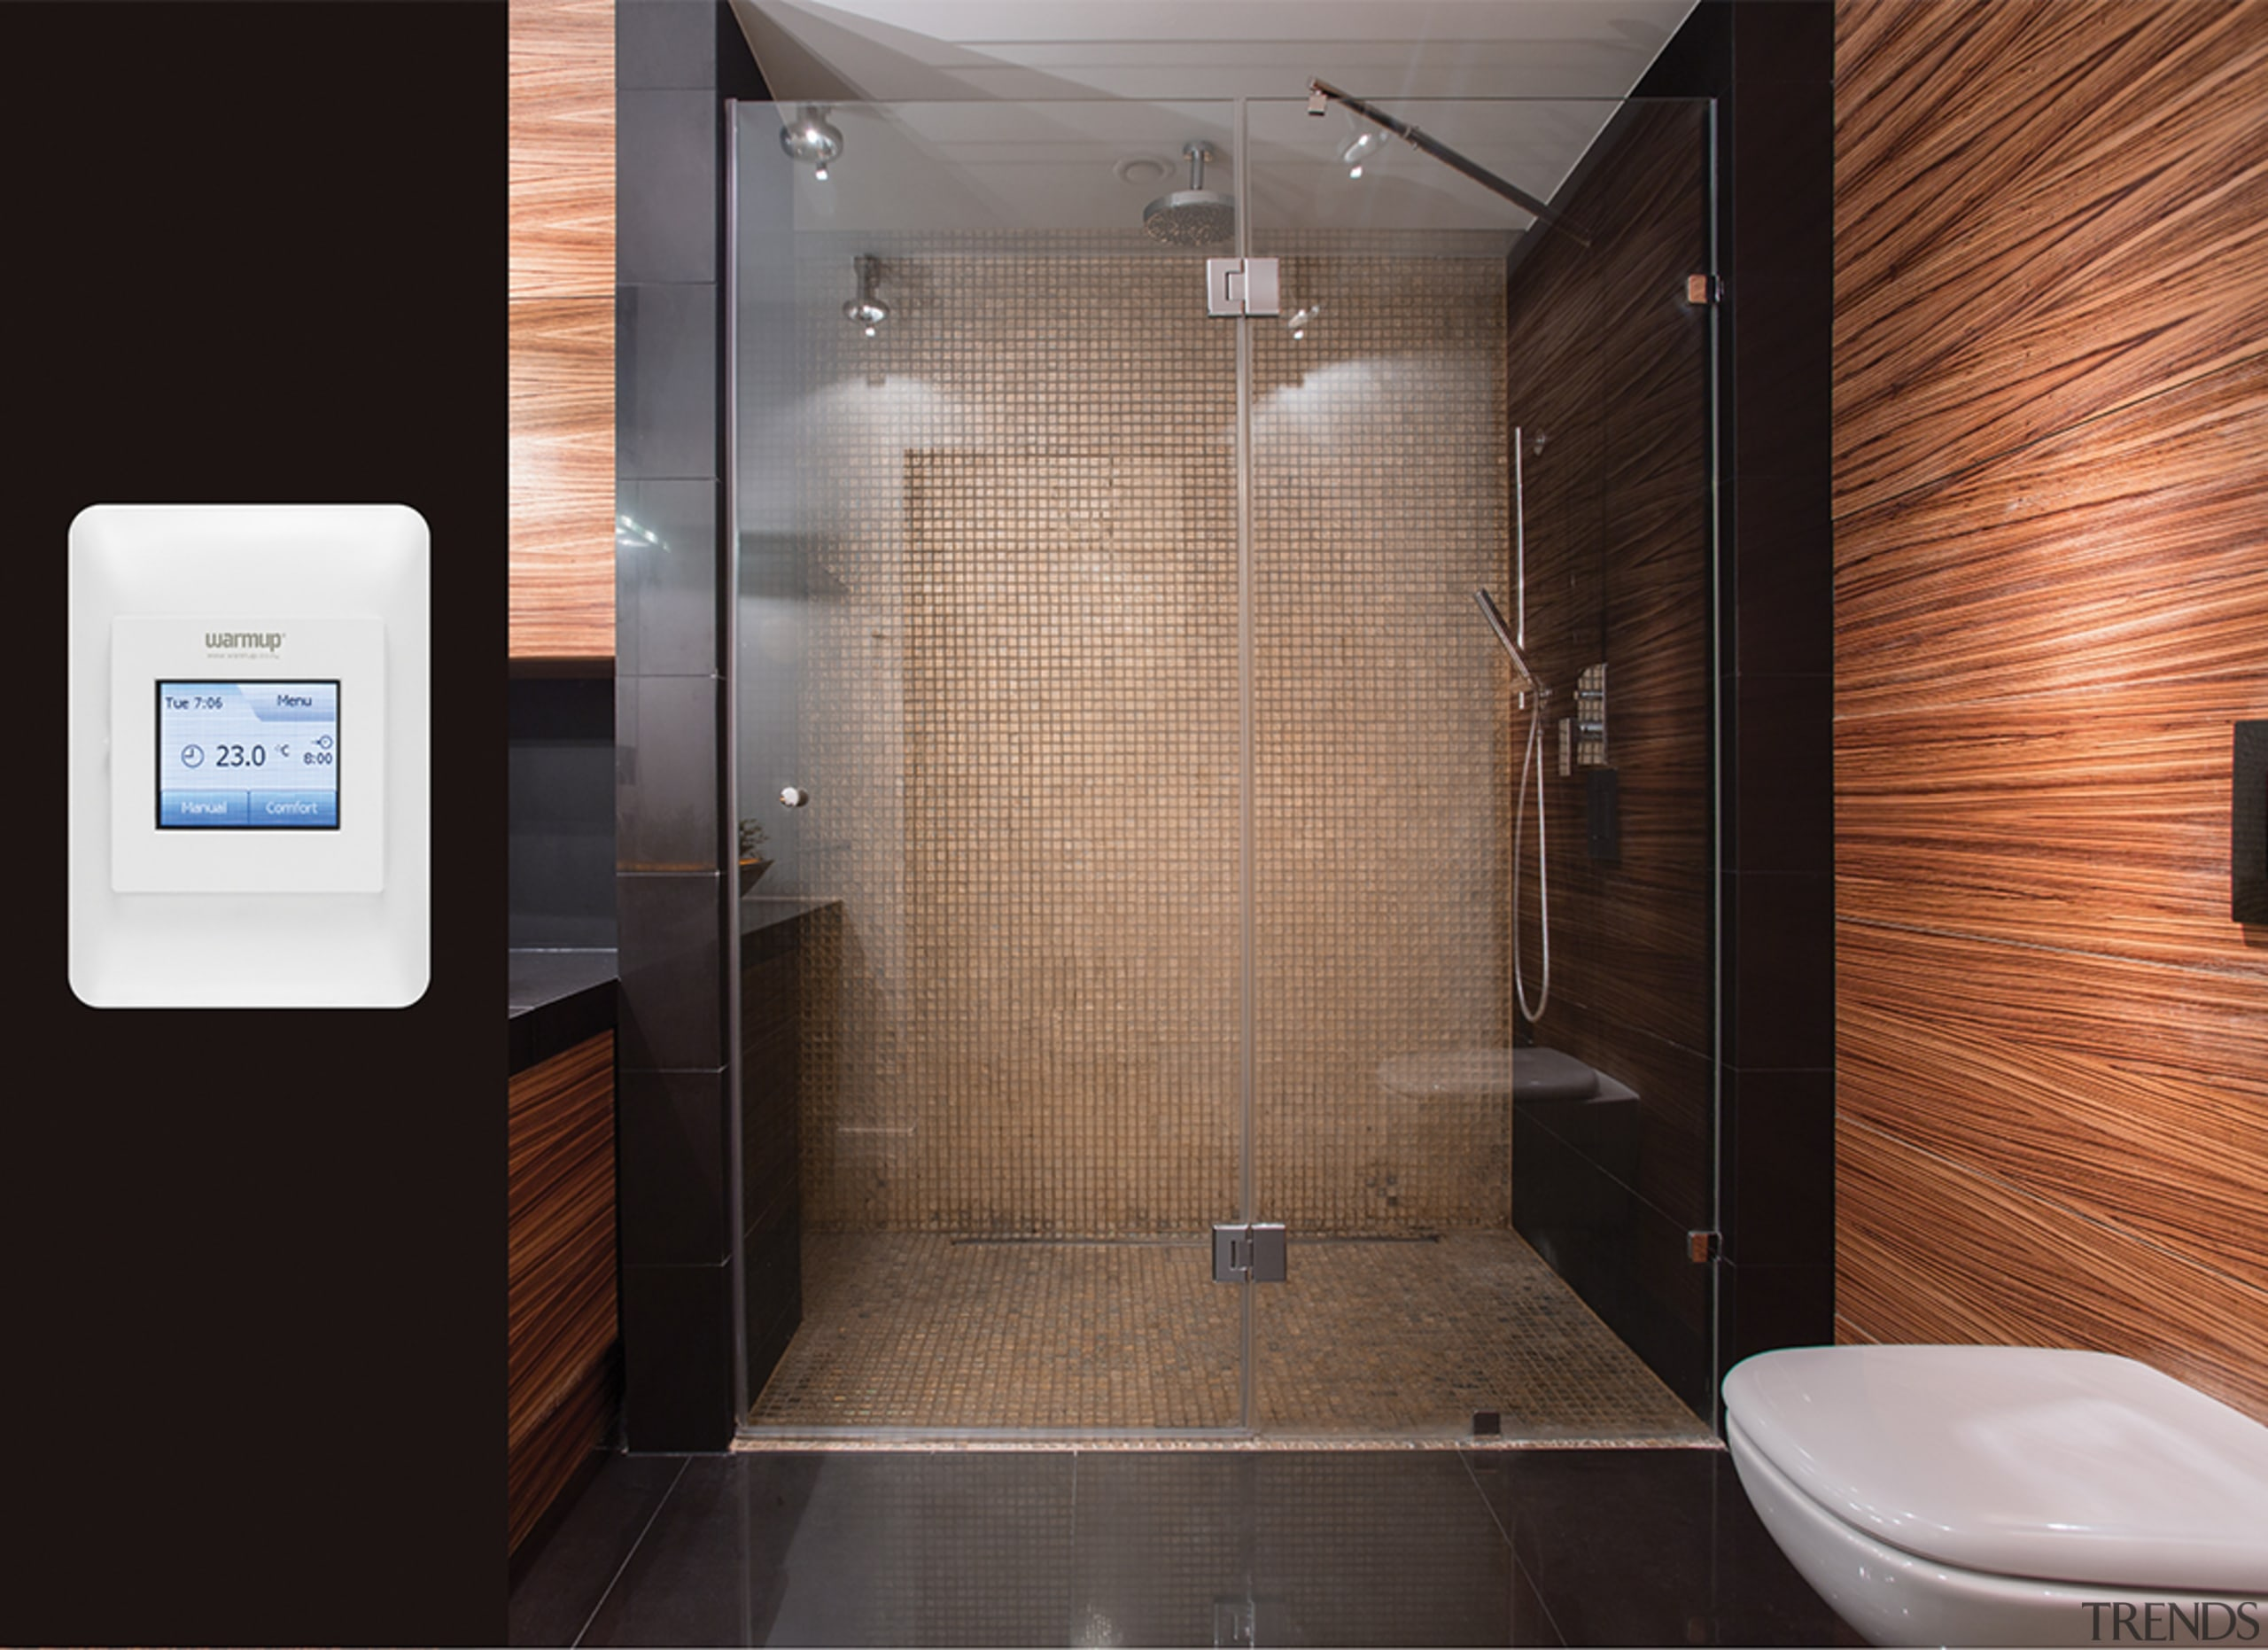 Thermostat - bathroom | floor | interior design bathroom, floor, interior design, plumbing fixture, room, tile, black